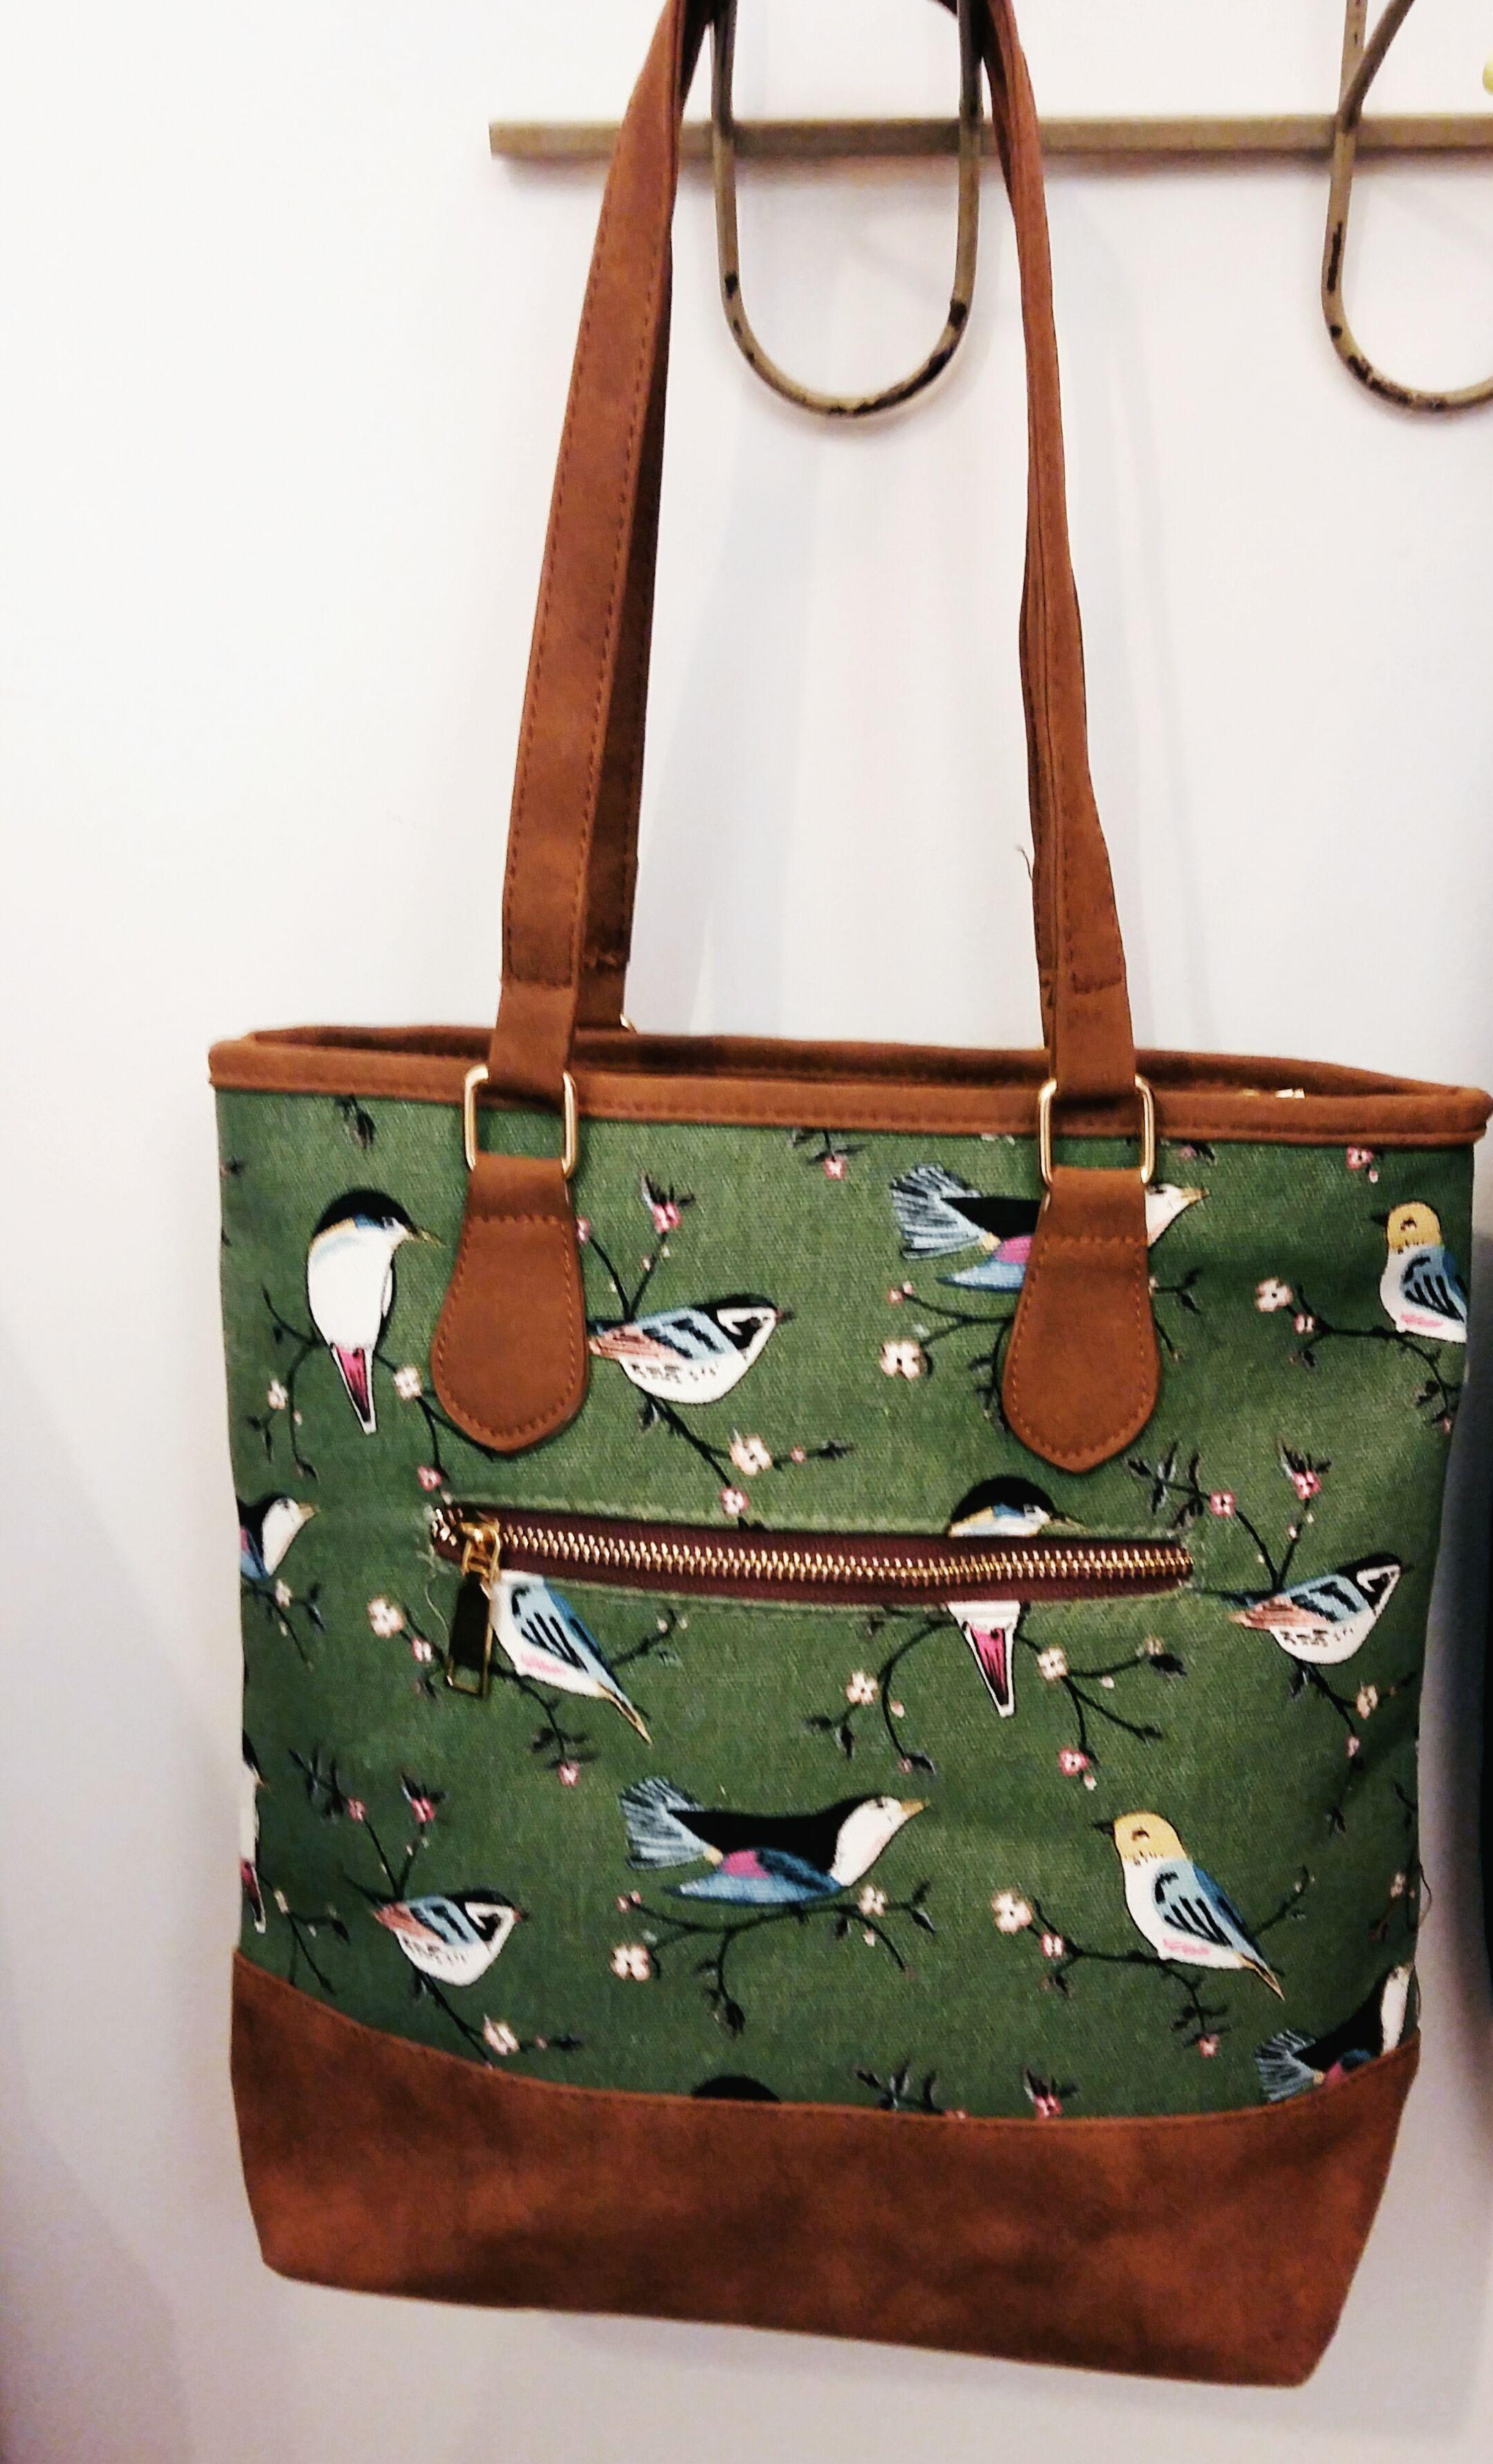 NEW - handbags £25 each